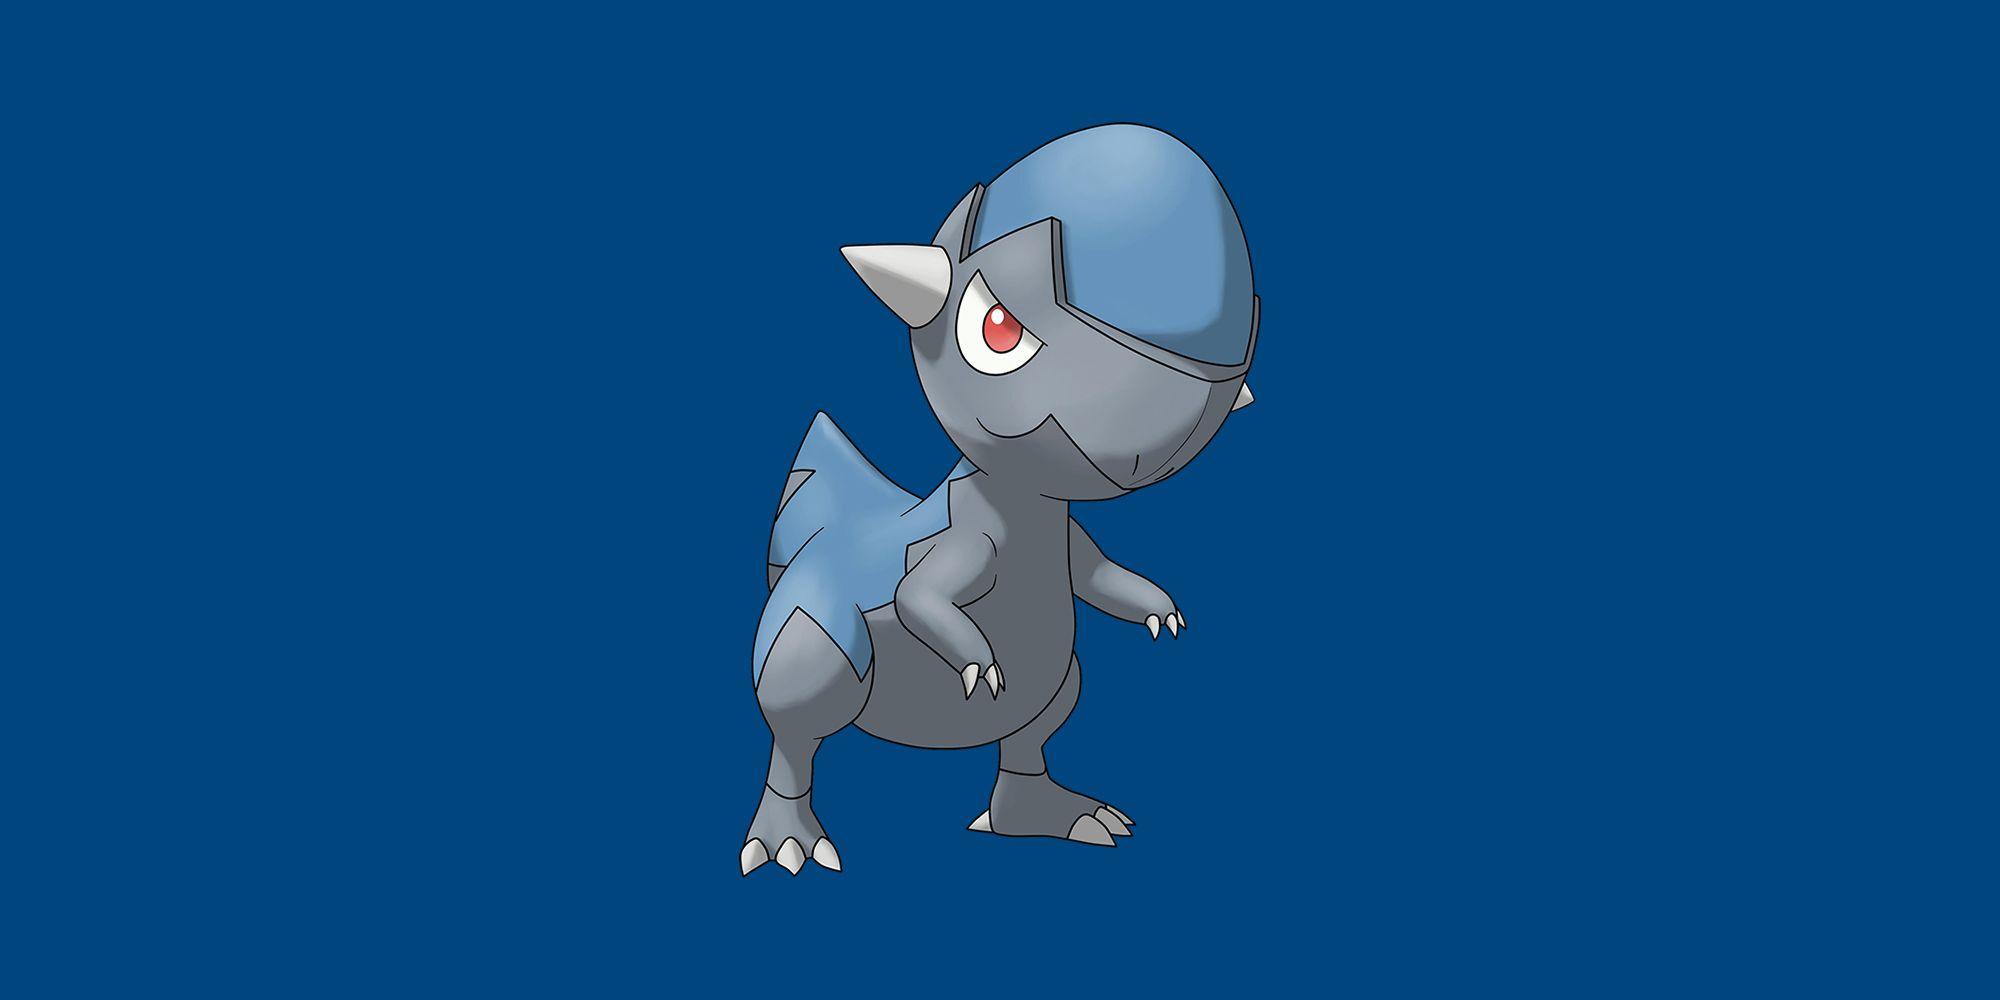 How to Find (& Catch) Cranidos in Pokémon GO (Sinnoh Collection)